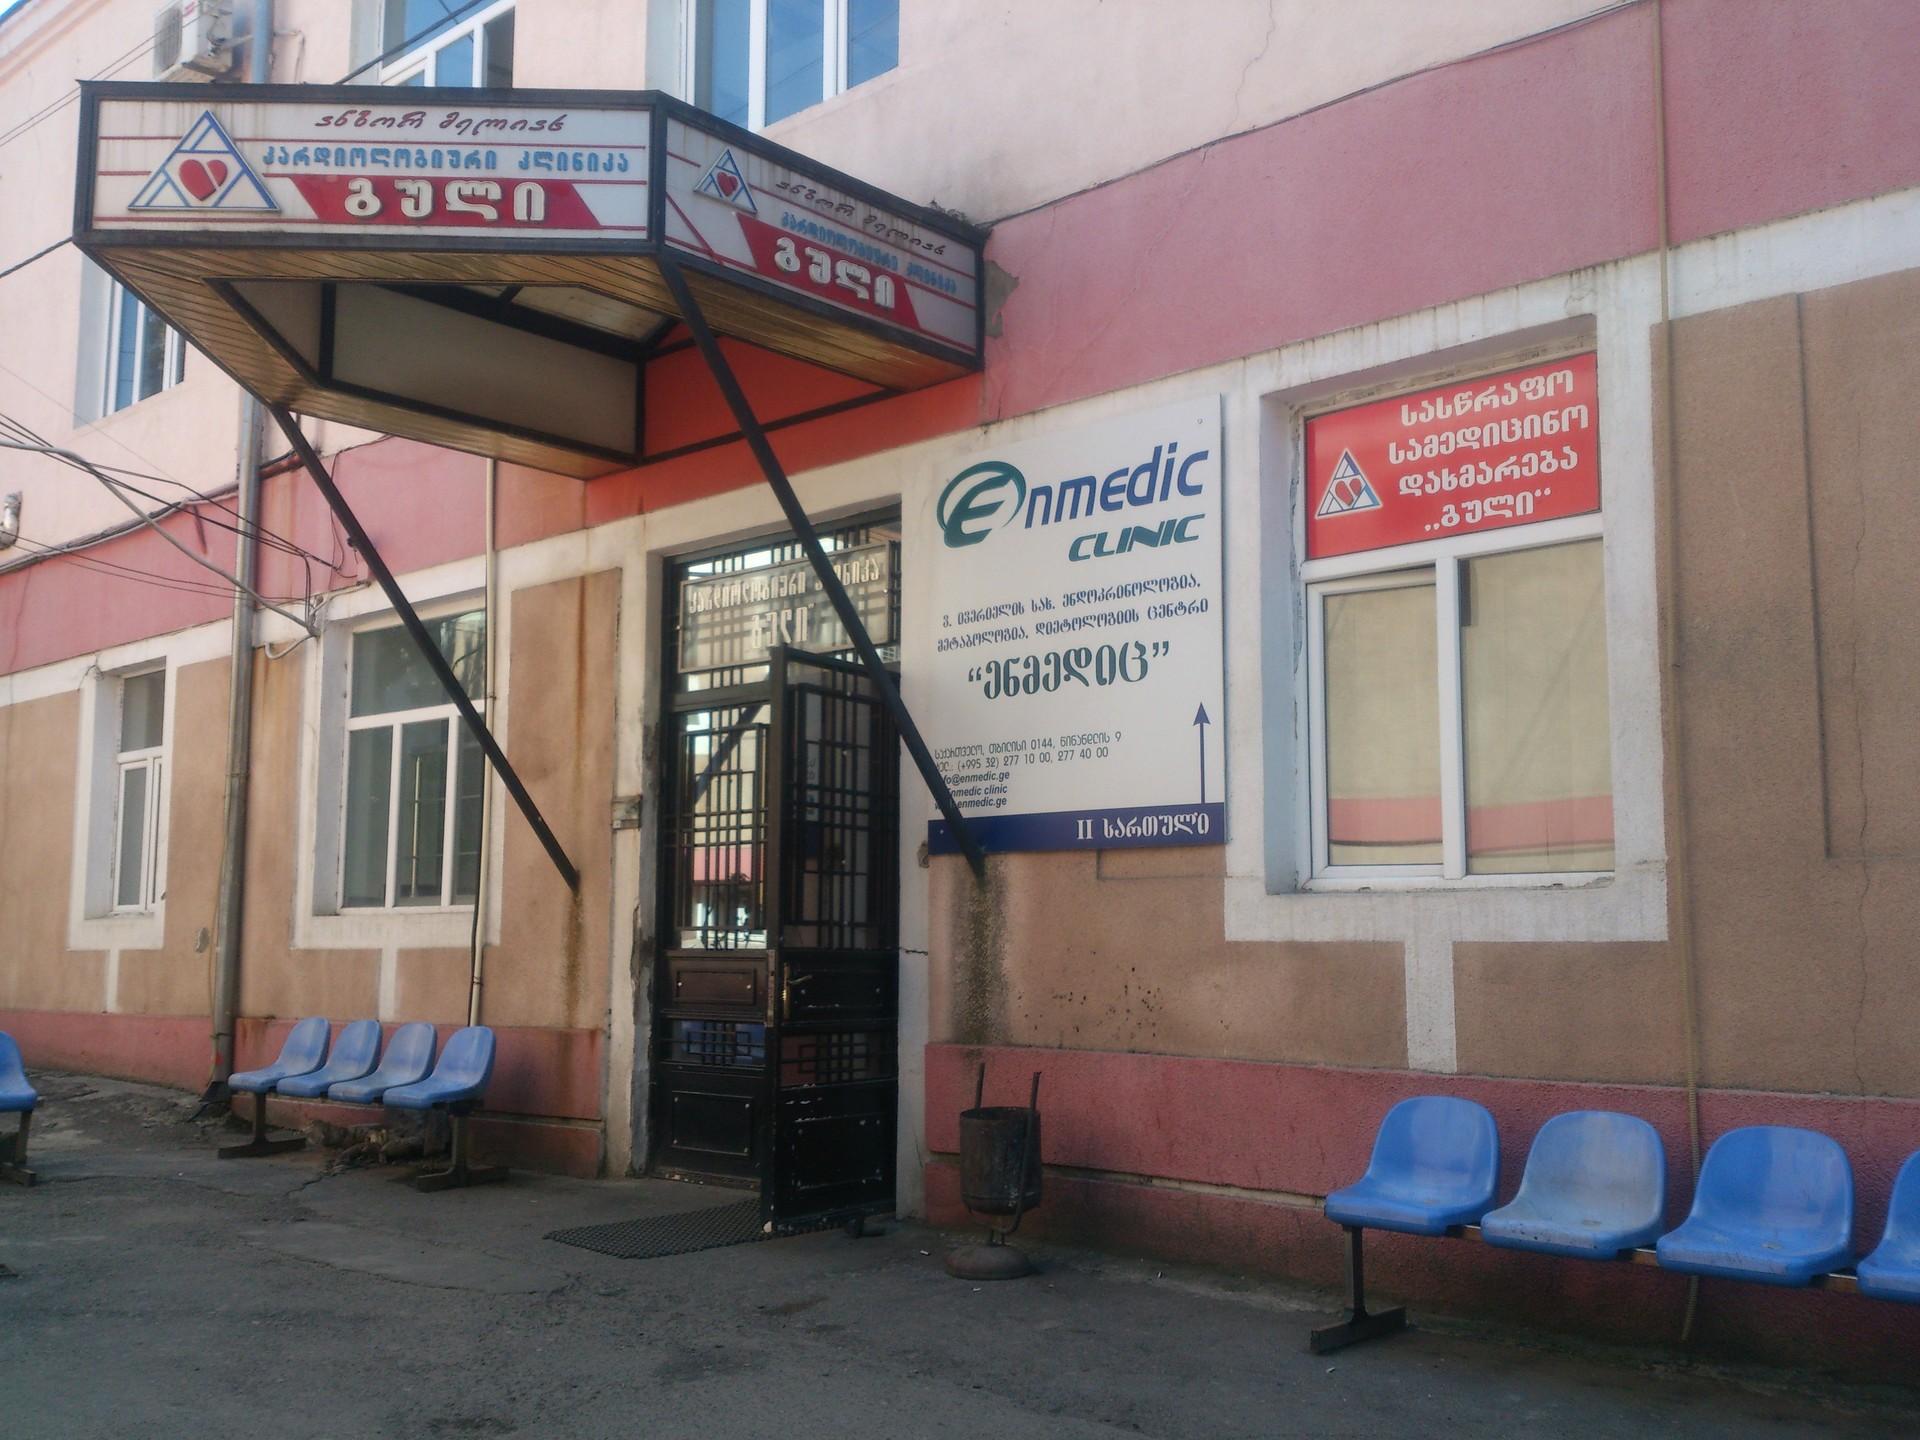 enmedic-clinic-f5400f62fd4390f60e56c5ead